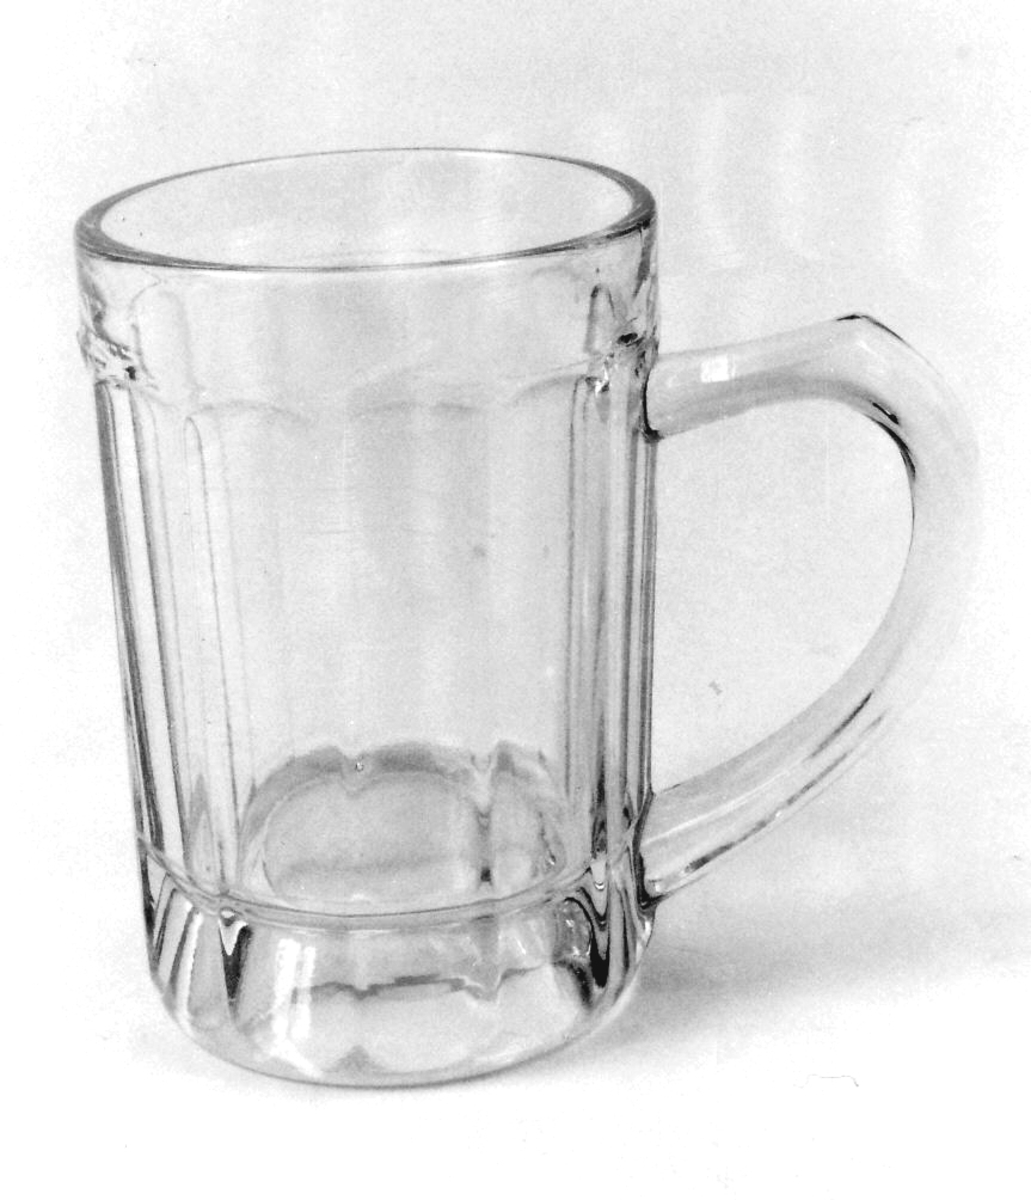 Ølkrus som A 00469,